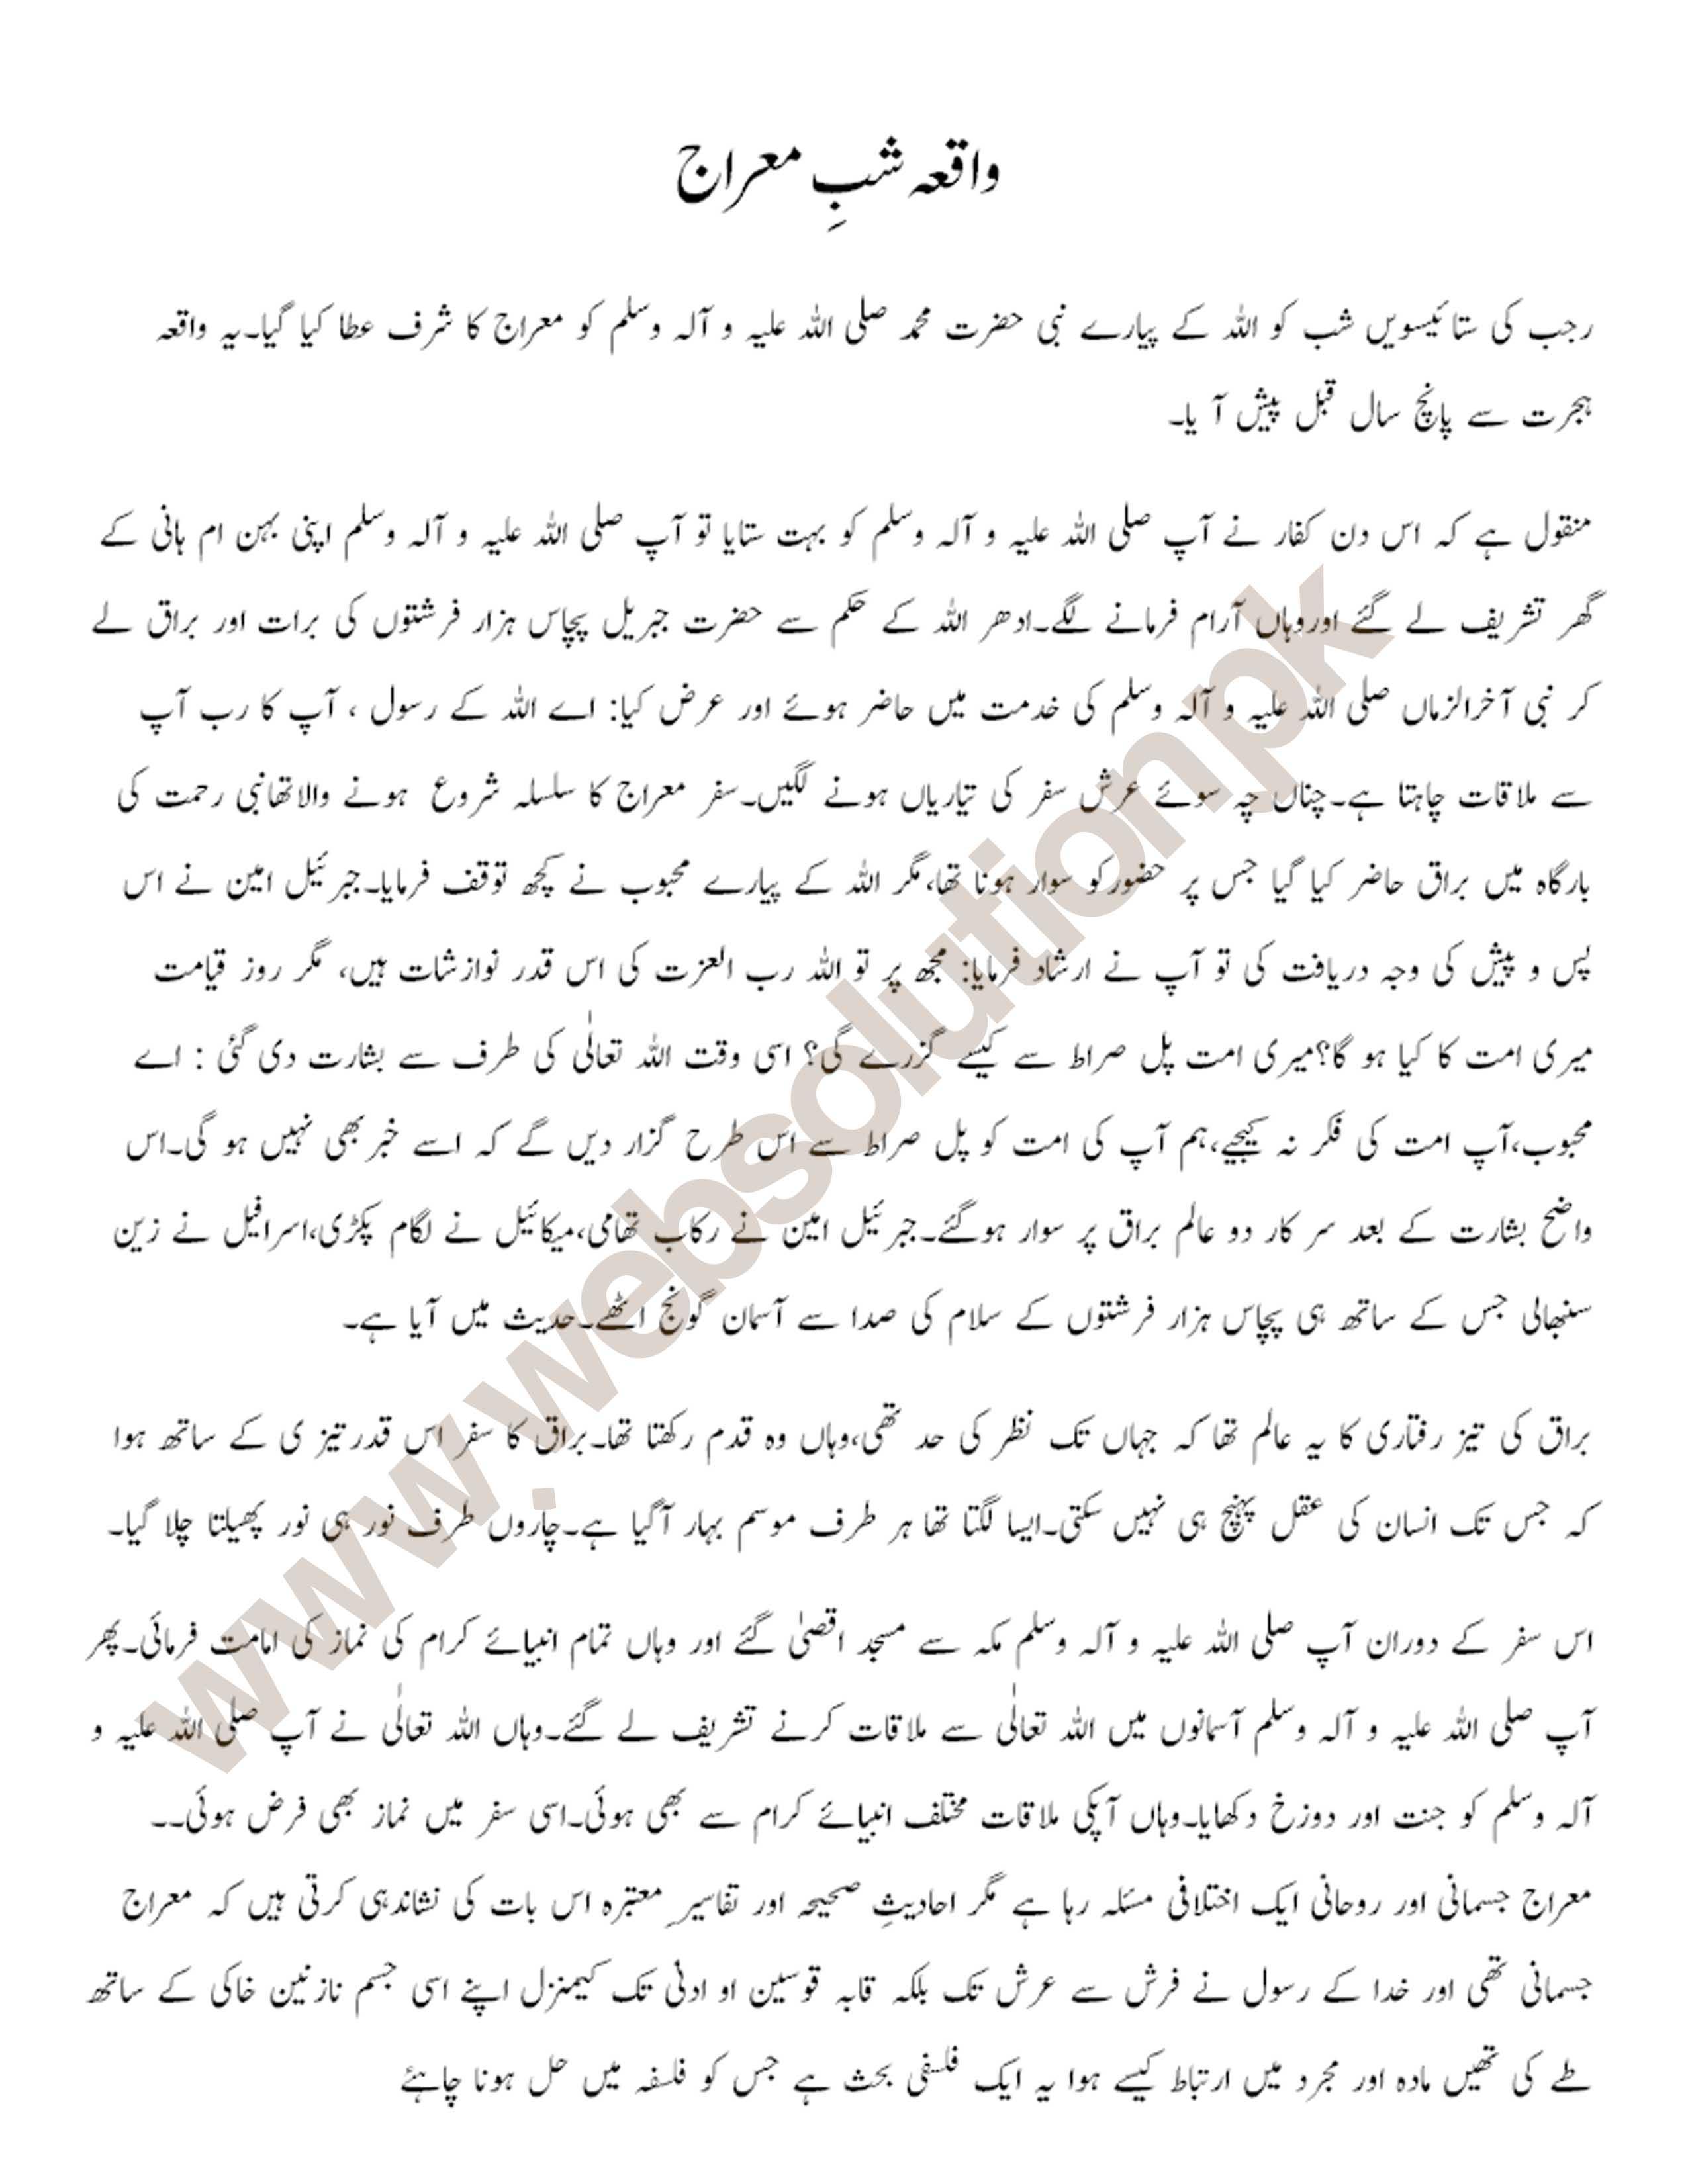 Shab-e-Meraj History In Urdu